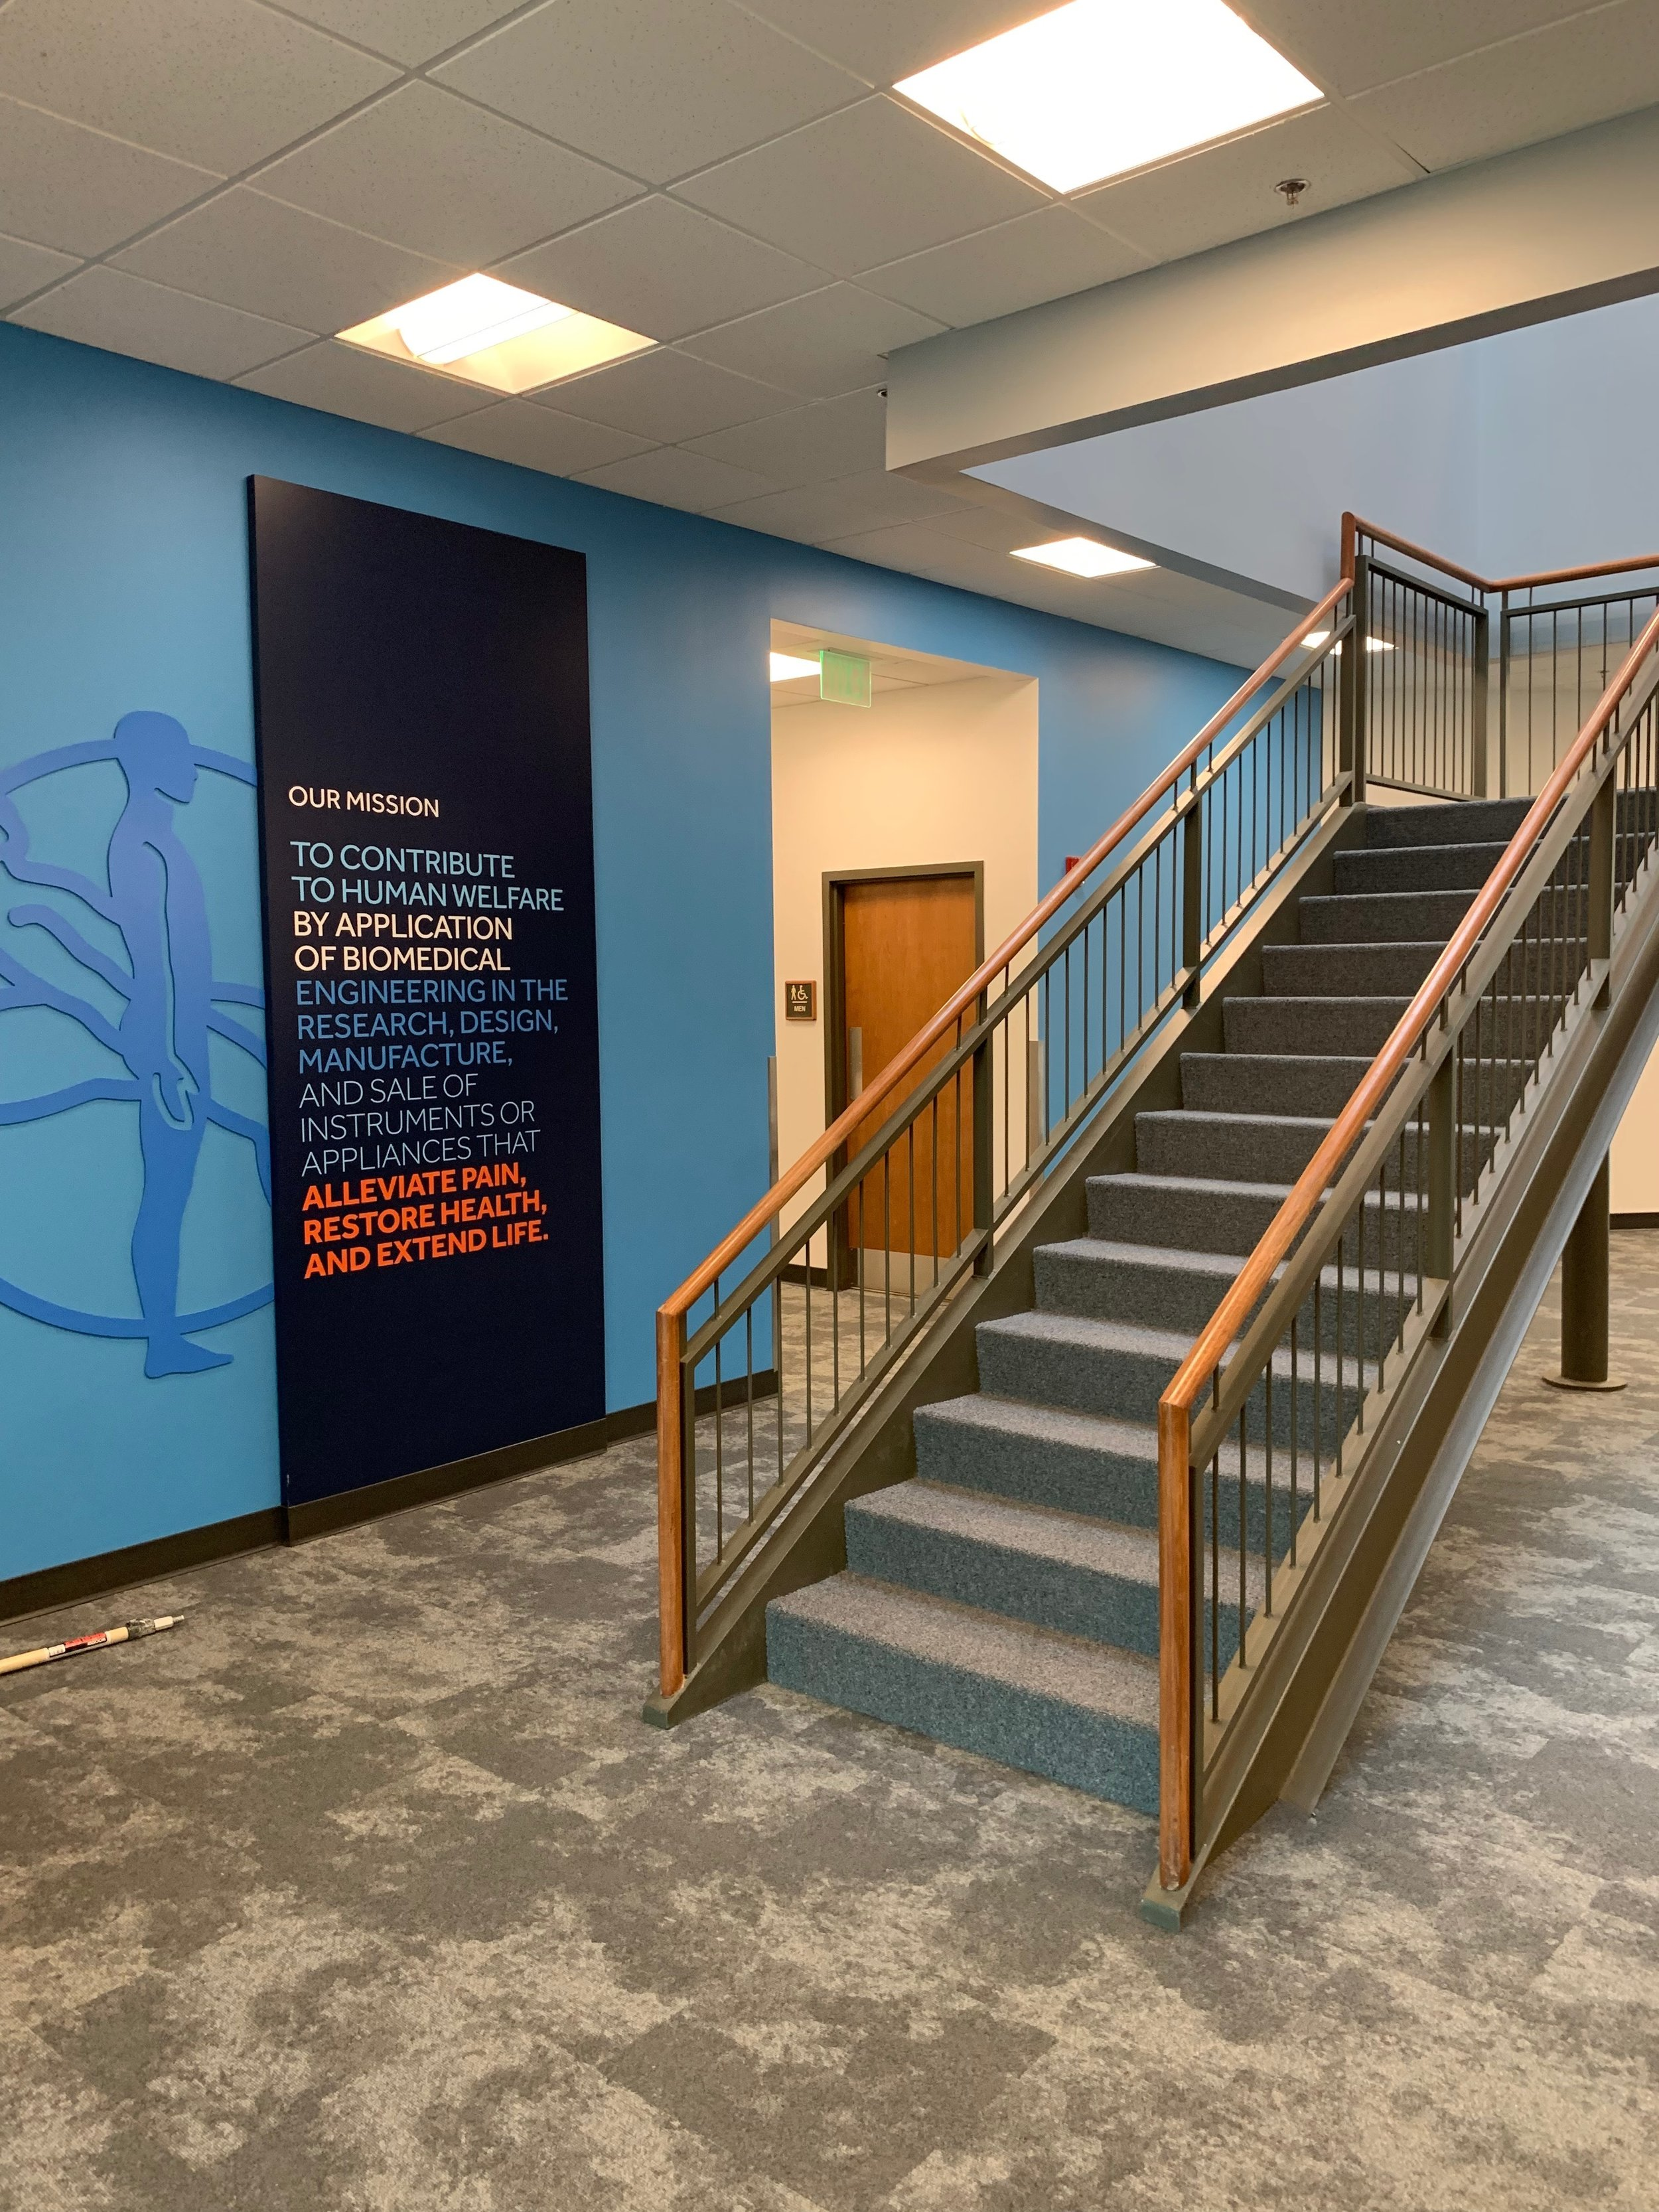 medtronic building threecore stairwell 4-27-19 #9.JPG